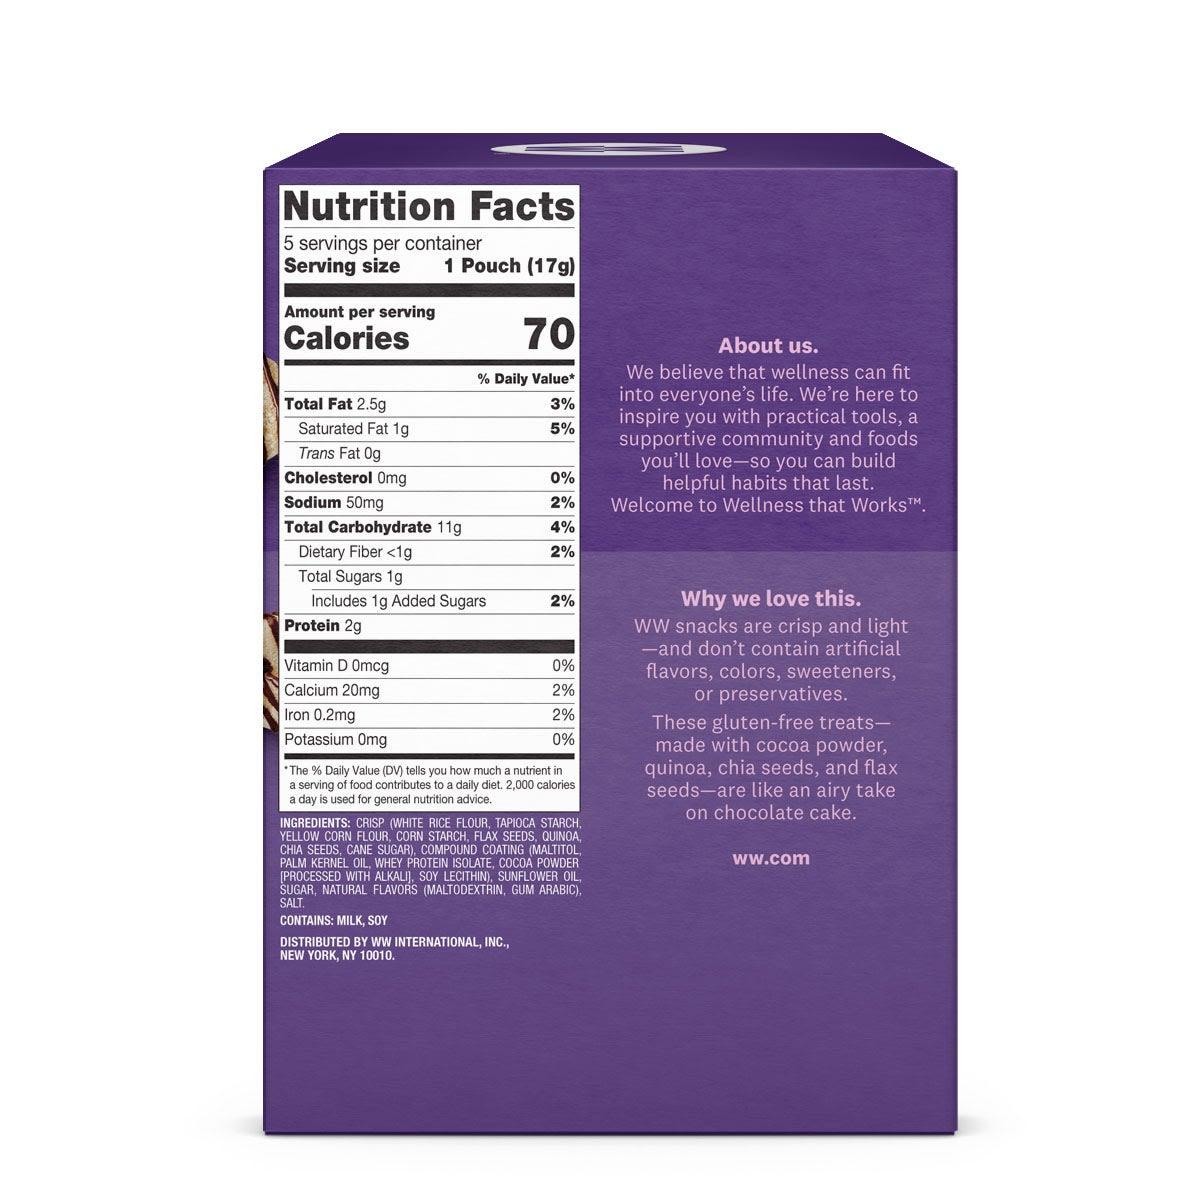 Chocolate Marshmallow Puffs - s2